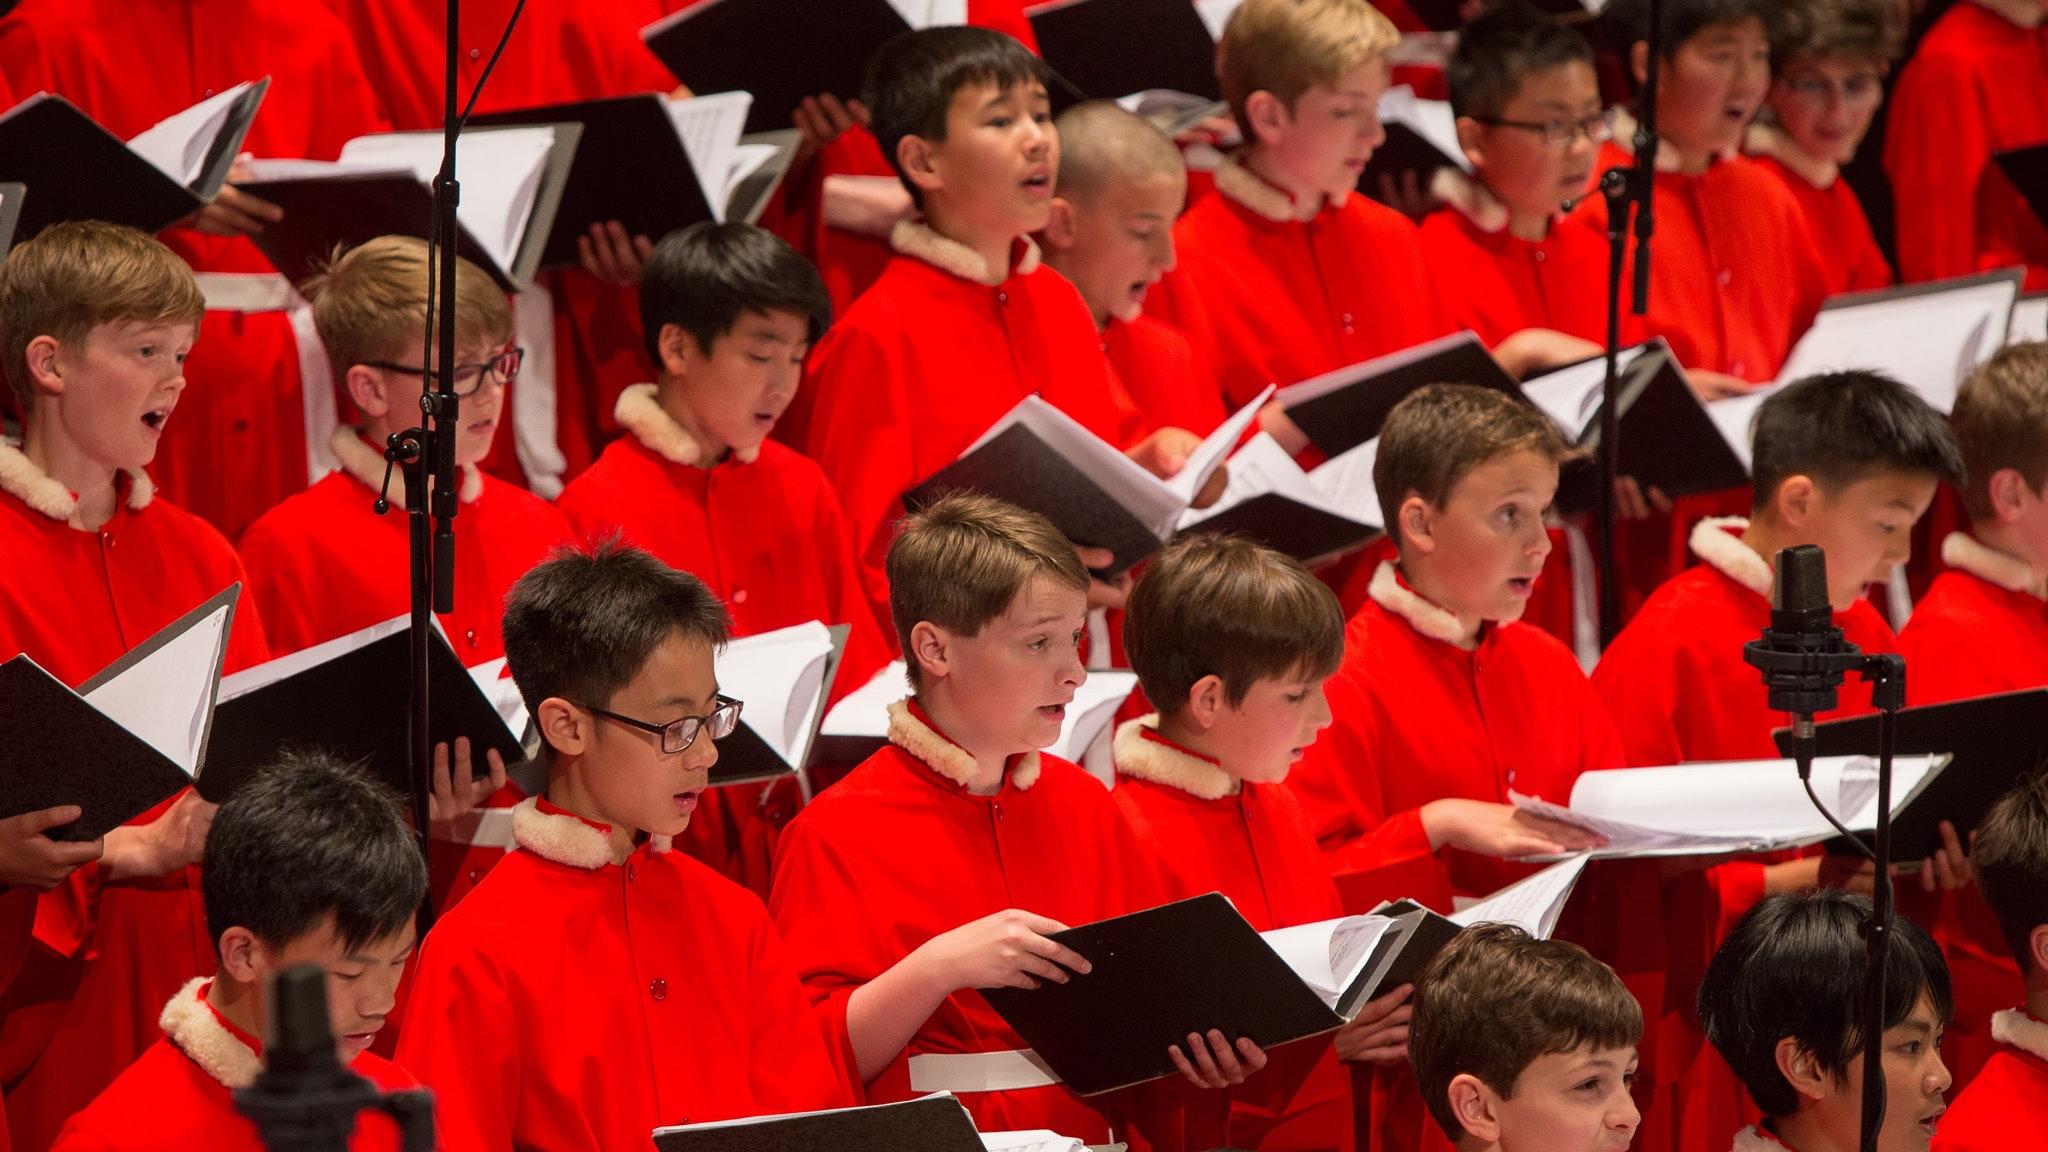 Celebrate Christmas with the National Boys Choir of Australia